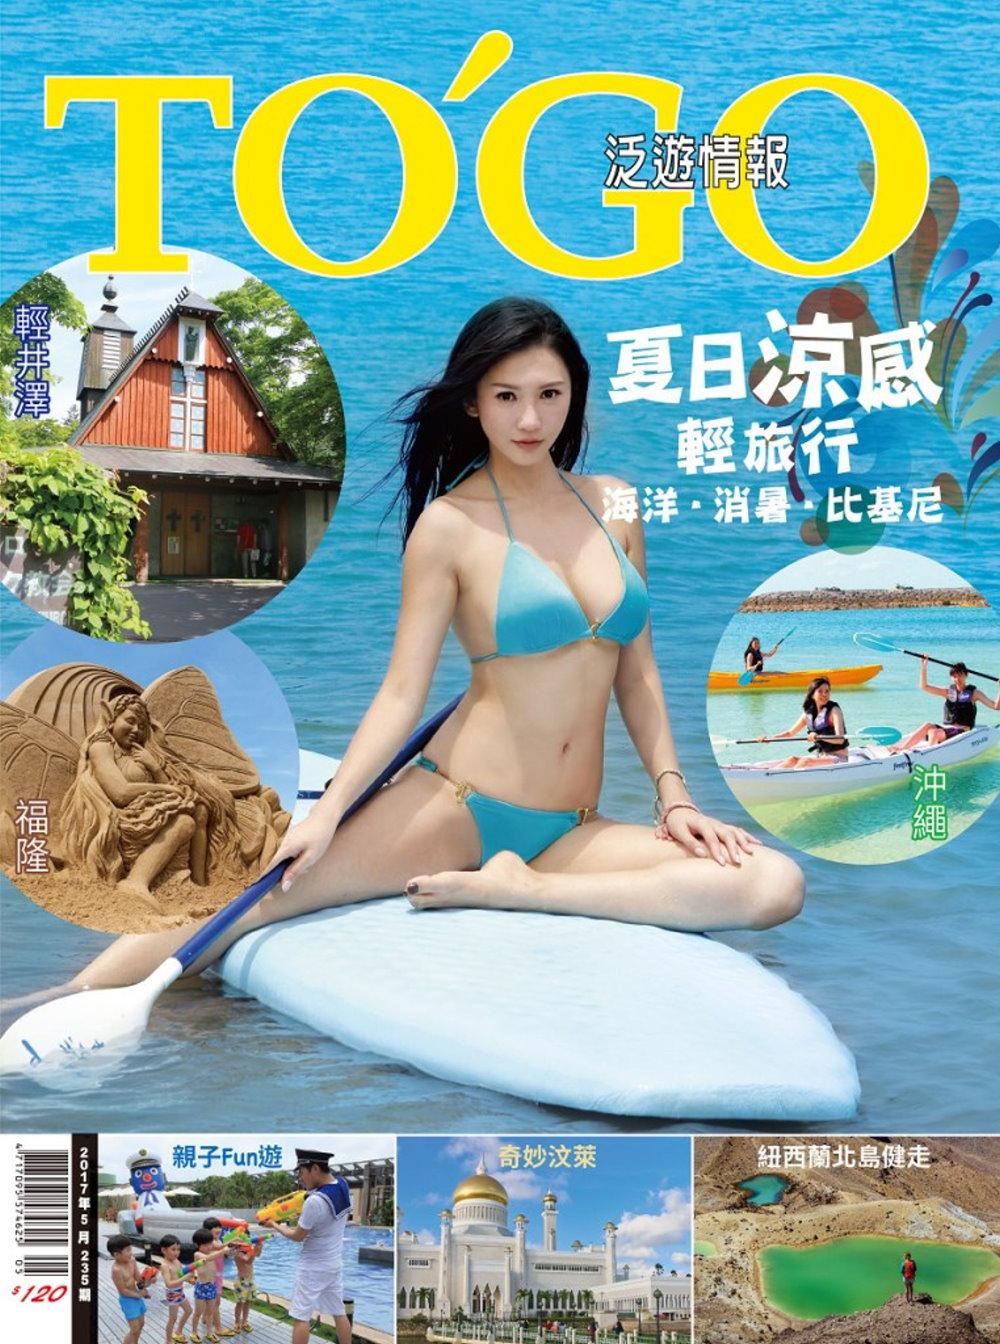 TOGO泛遊情報 5月號 2017第235期